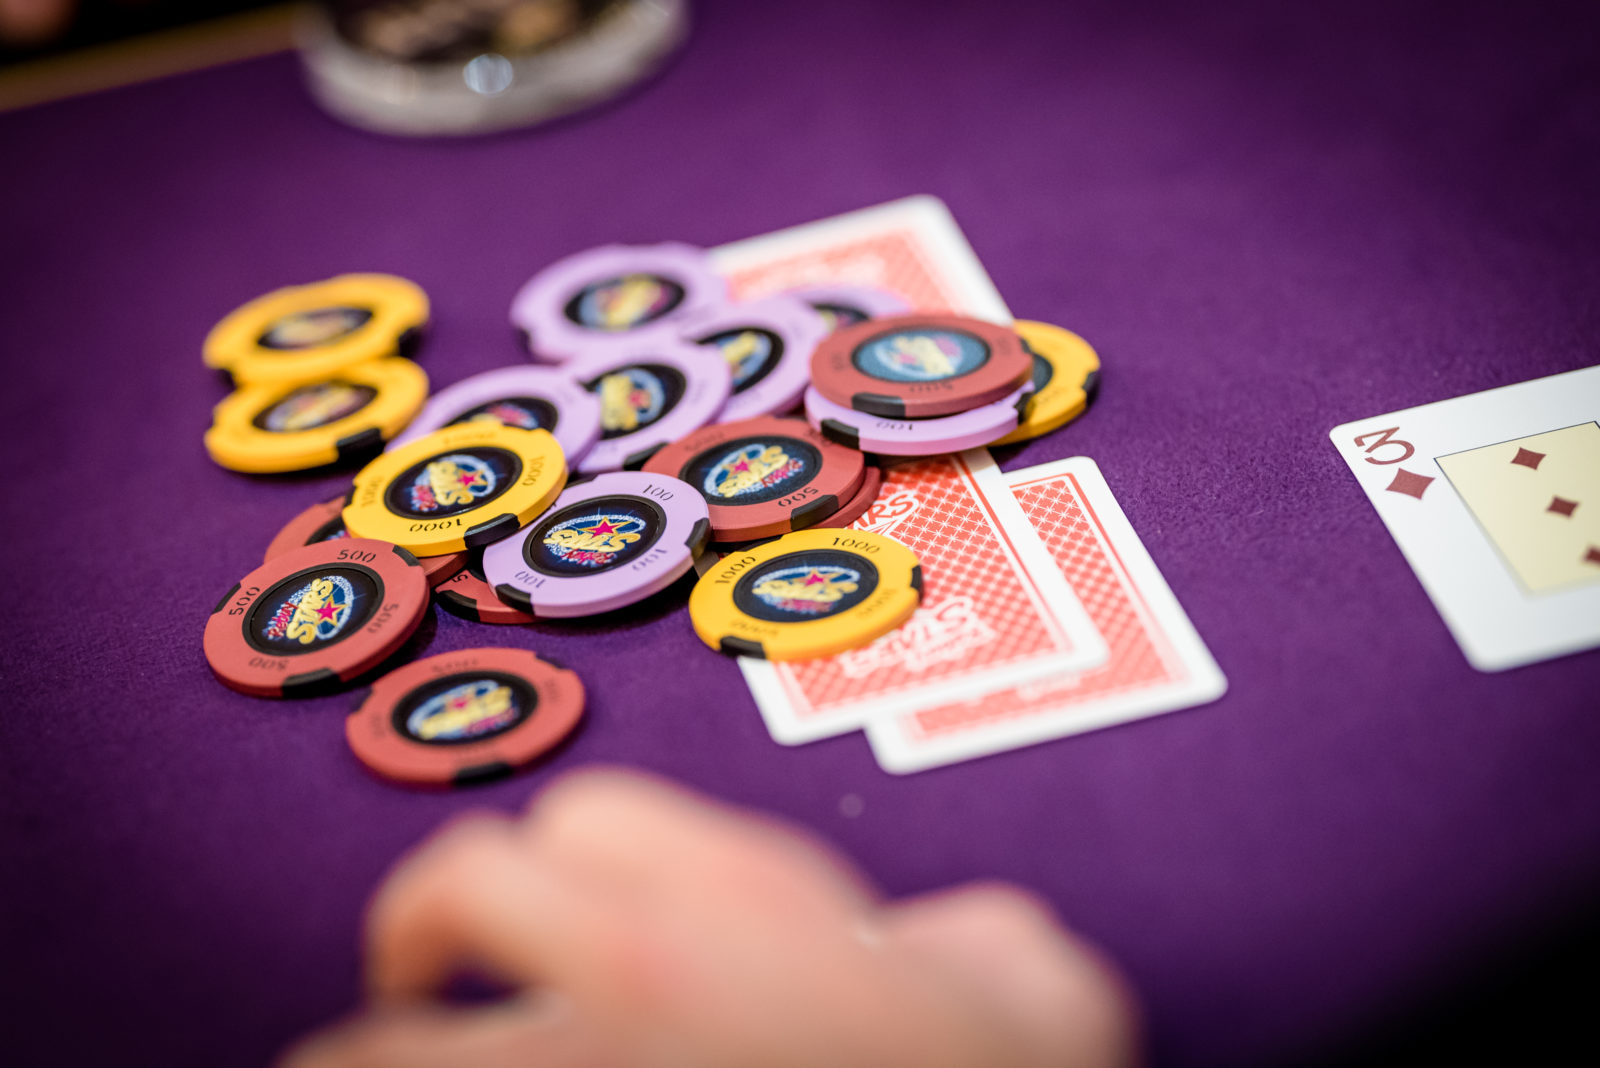 Rozhodujici hra v pokerovem turnaji v Savarinu na Prikopech